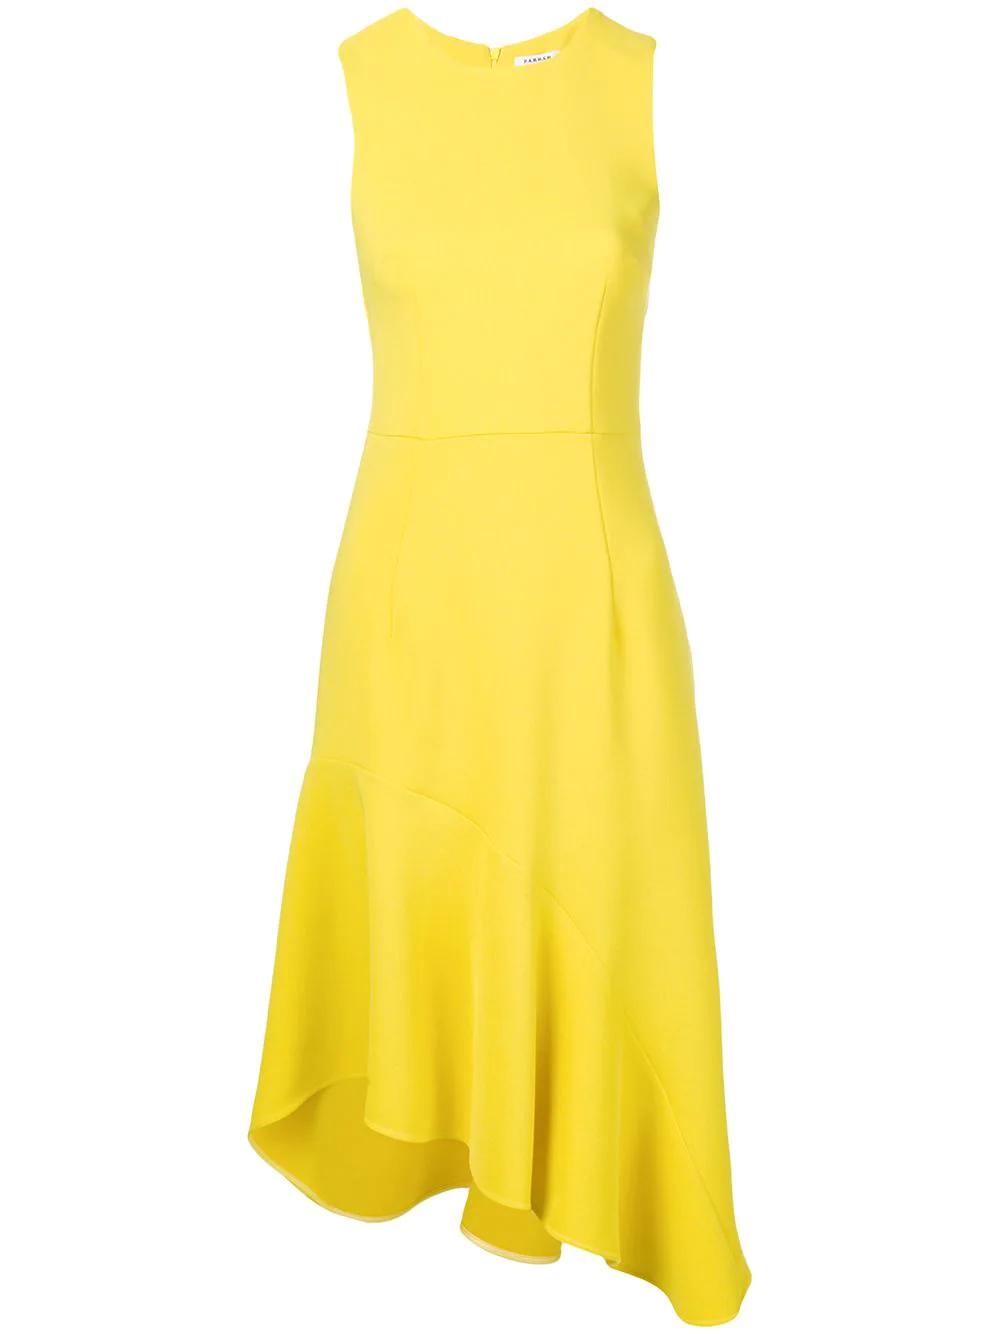 P.A.R.O.S.H.   асимметричное платье без рукавов   Clouty